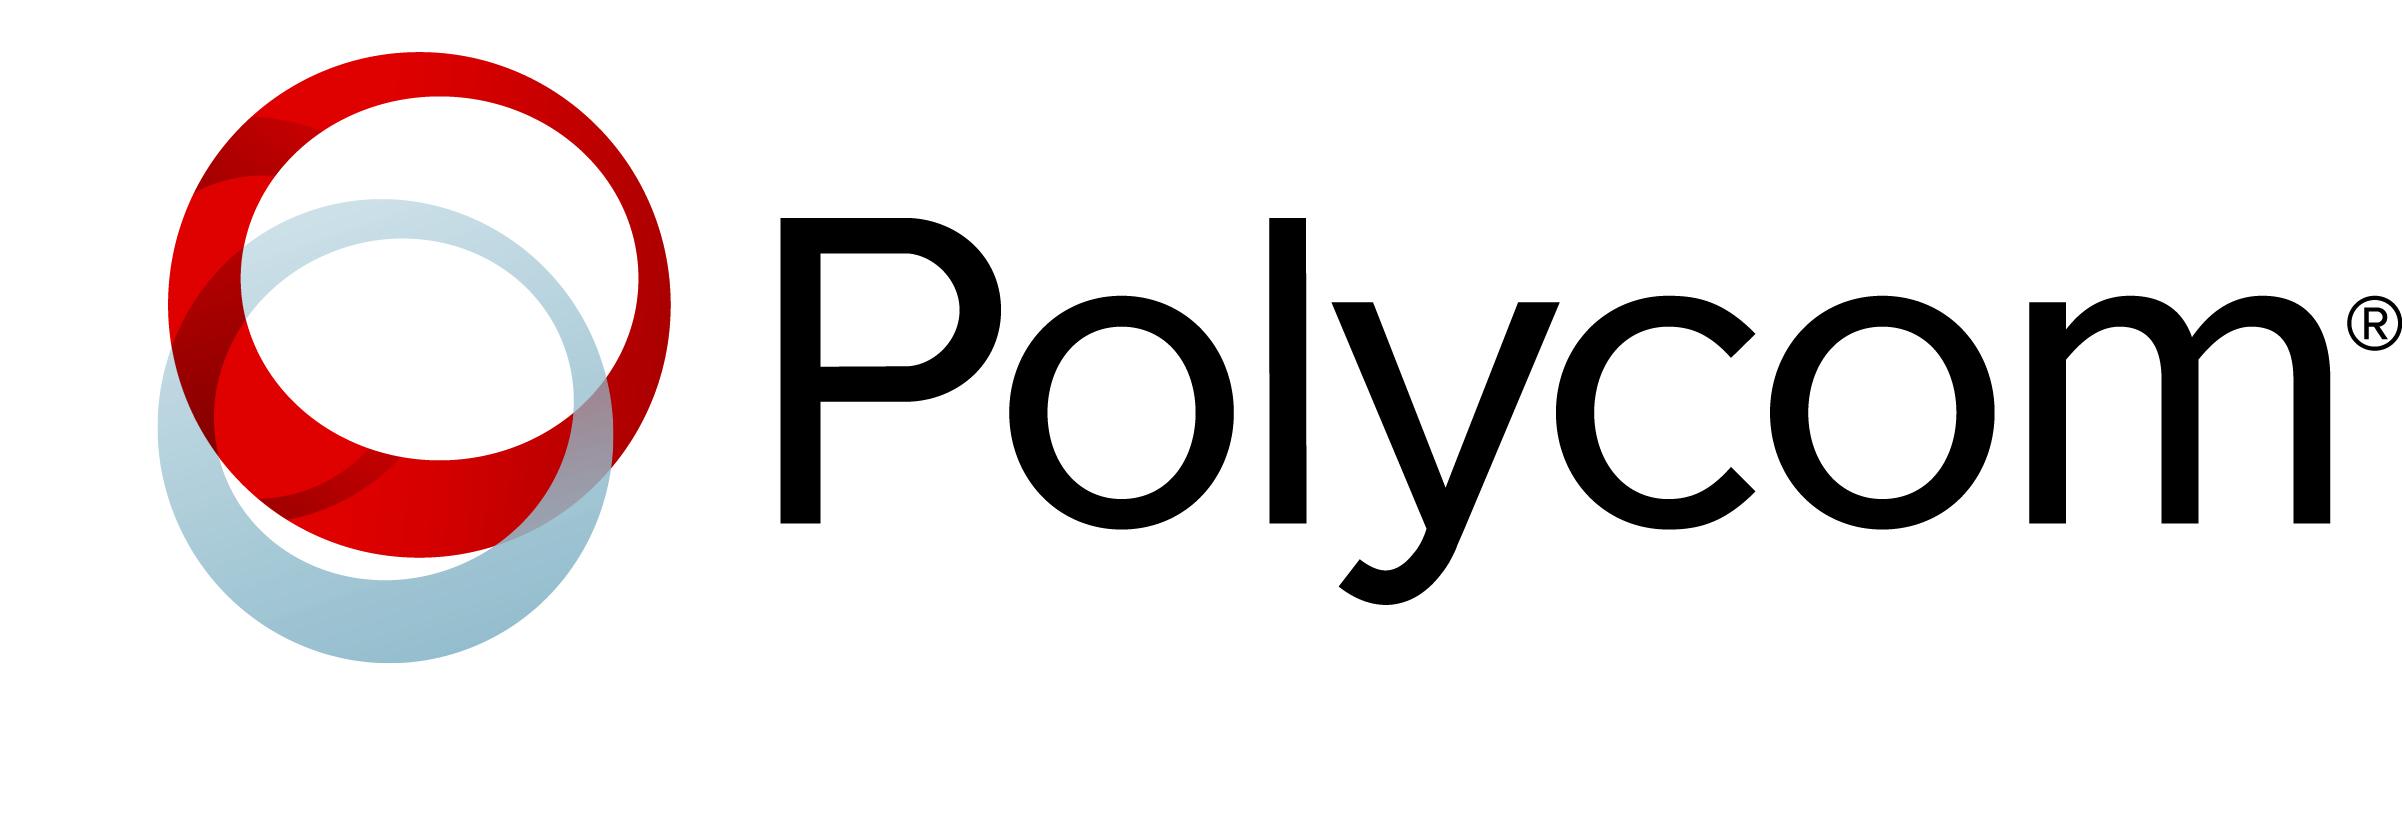 polycom.jpg